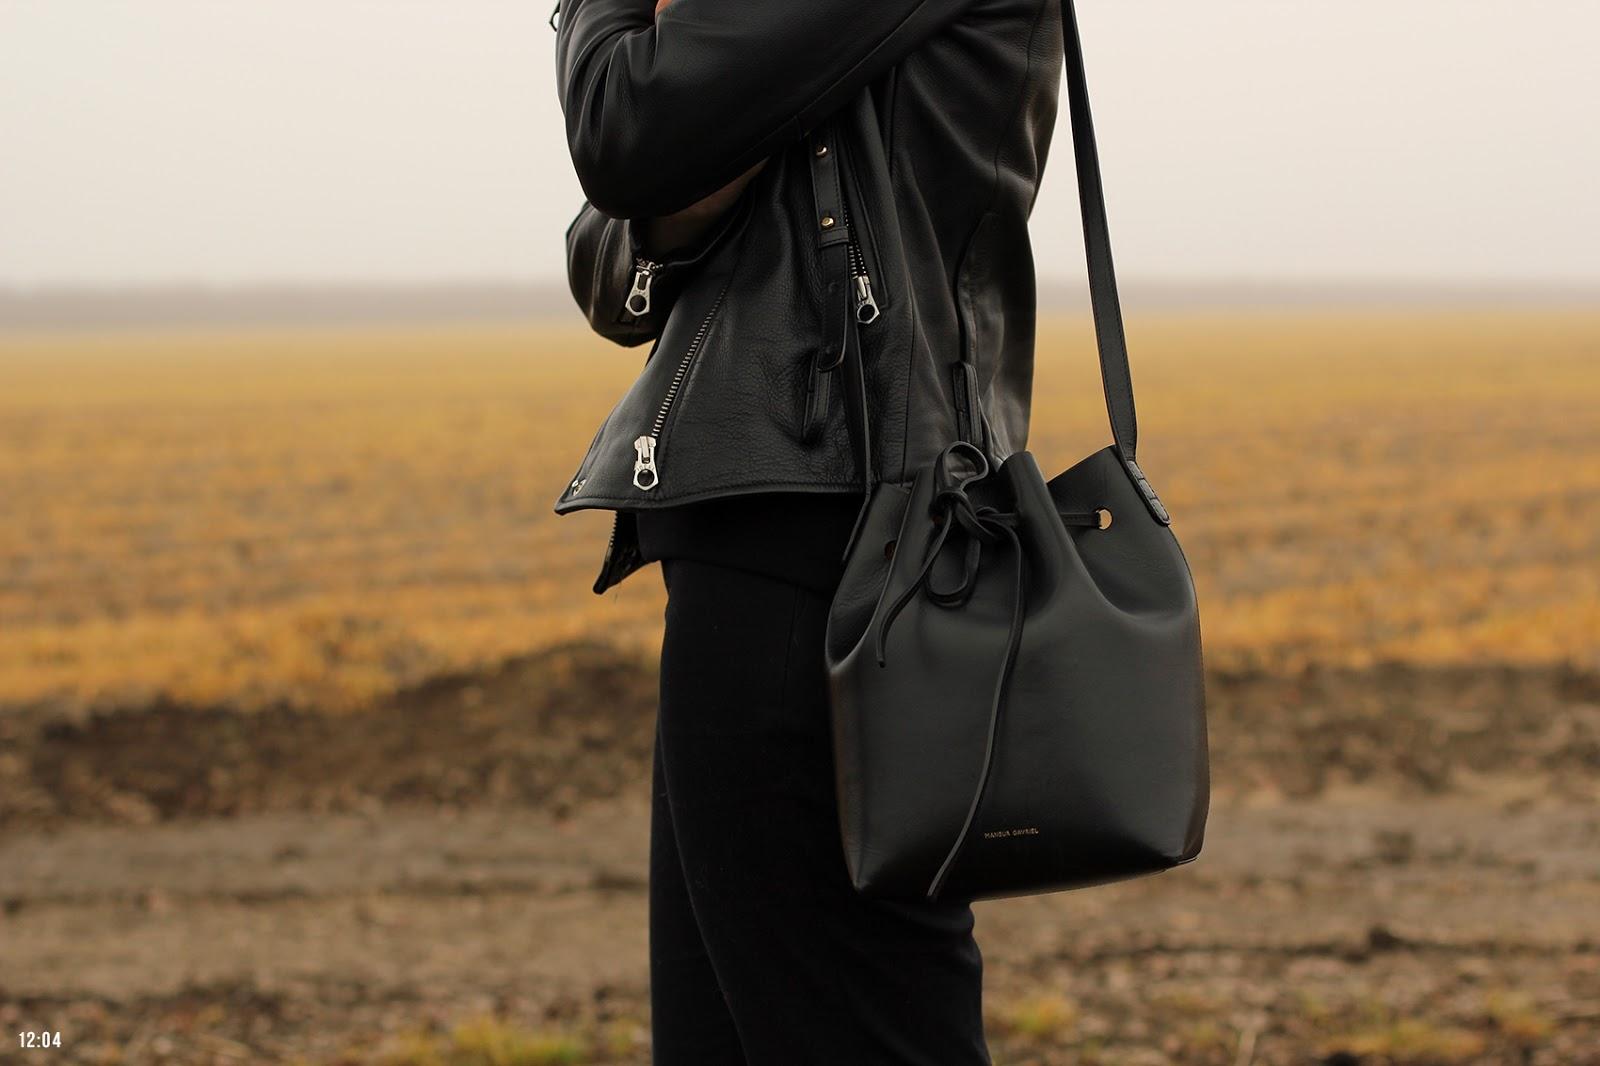 567-twelveofour-mansur-gavriel-madewell-leather-jacket-IMG_5672.jpg